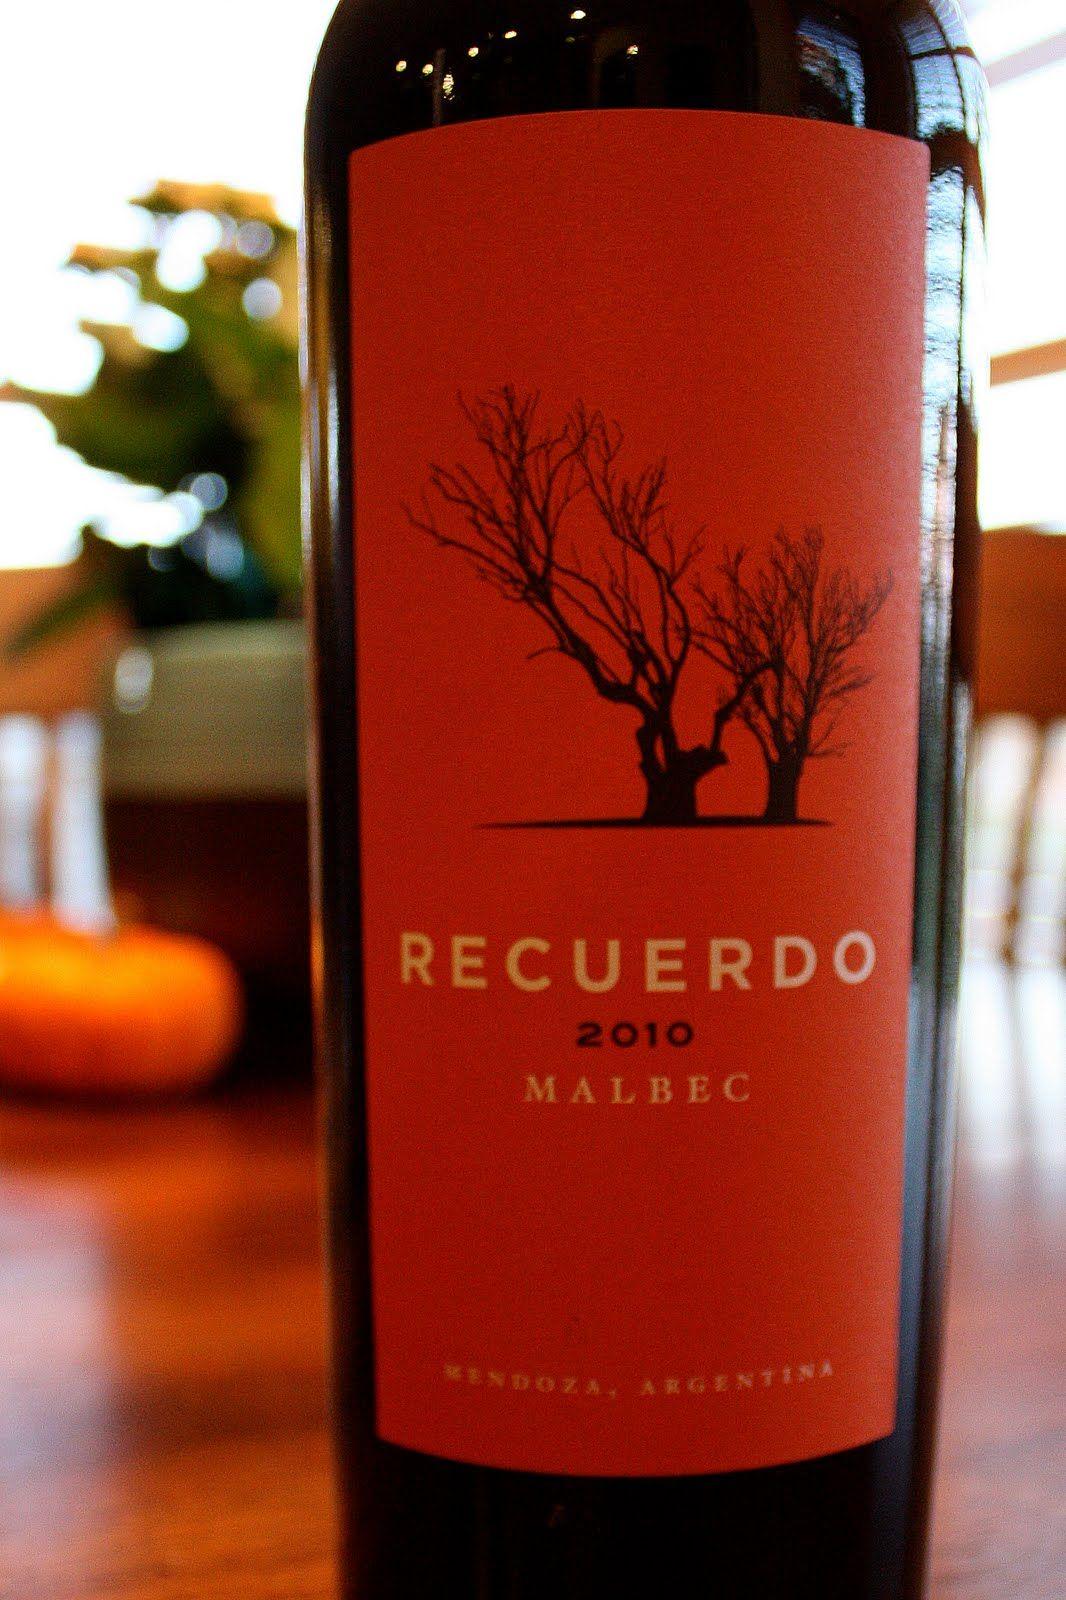 Recuerdo Malbec Http Recuerdowines Com The Wines Malbec Malbec Wine Wine Snob